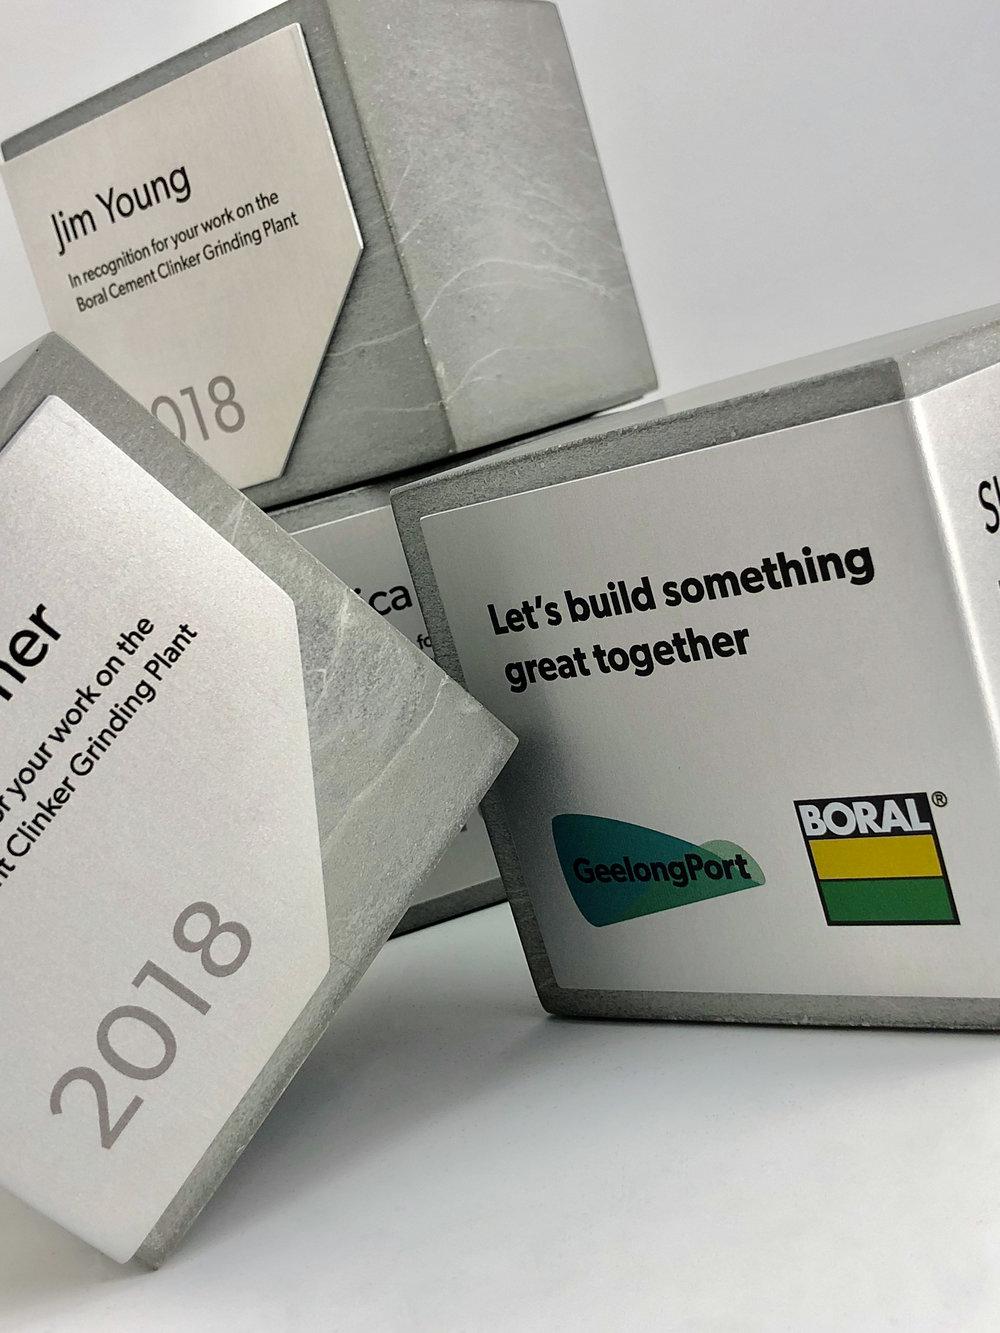 geelong-port-cement-cube-awards-trophy-01.jpg